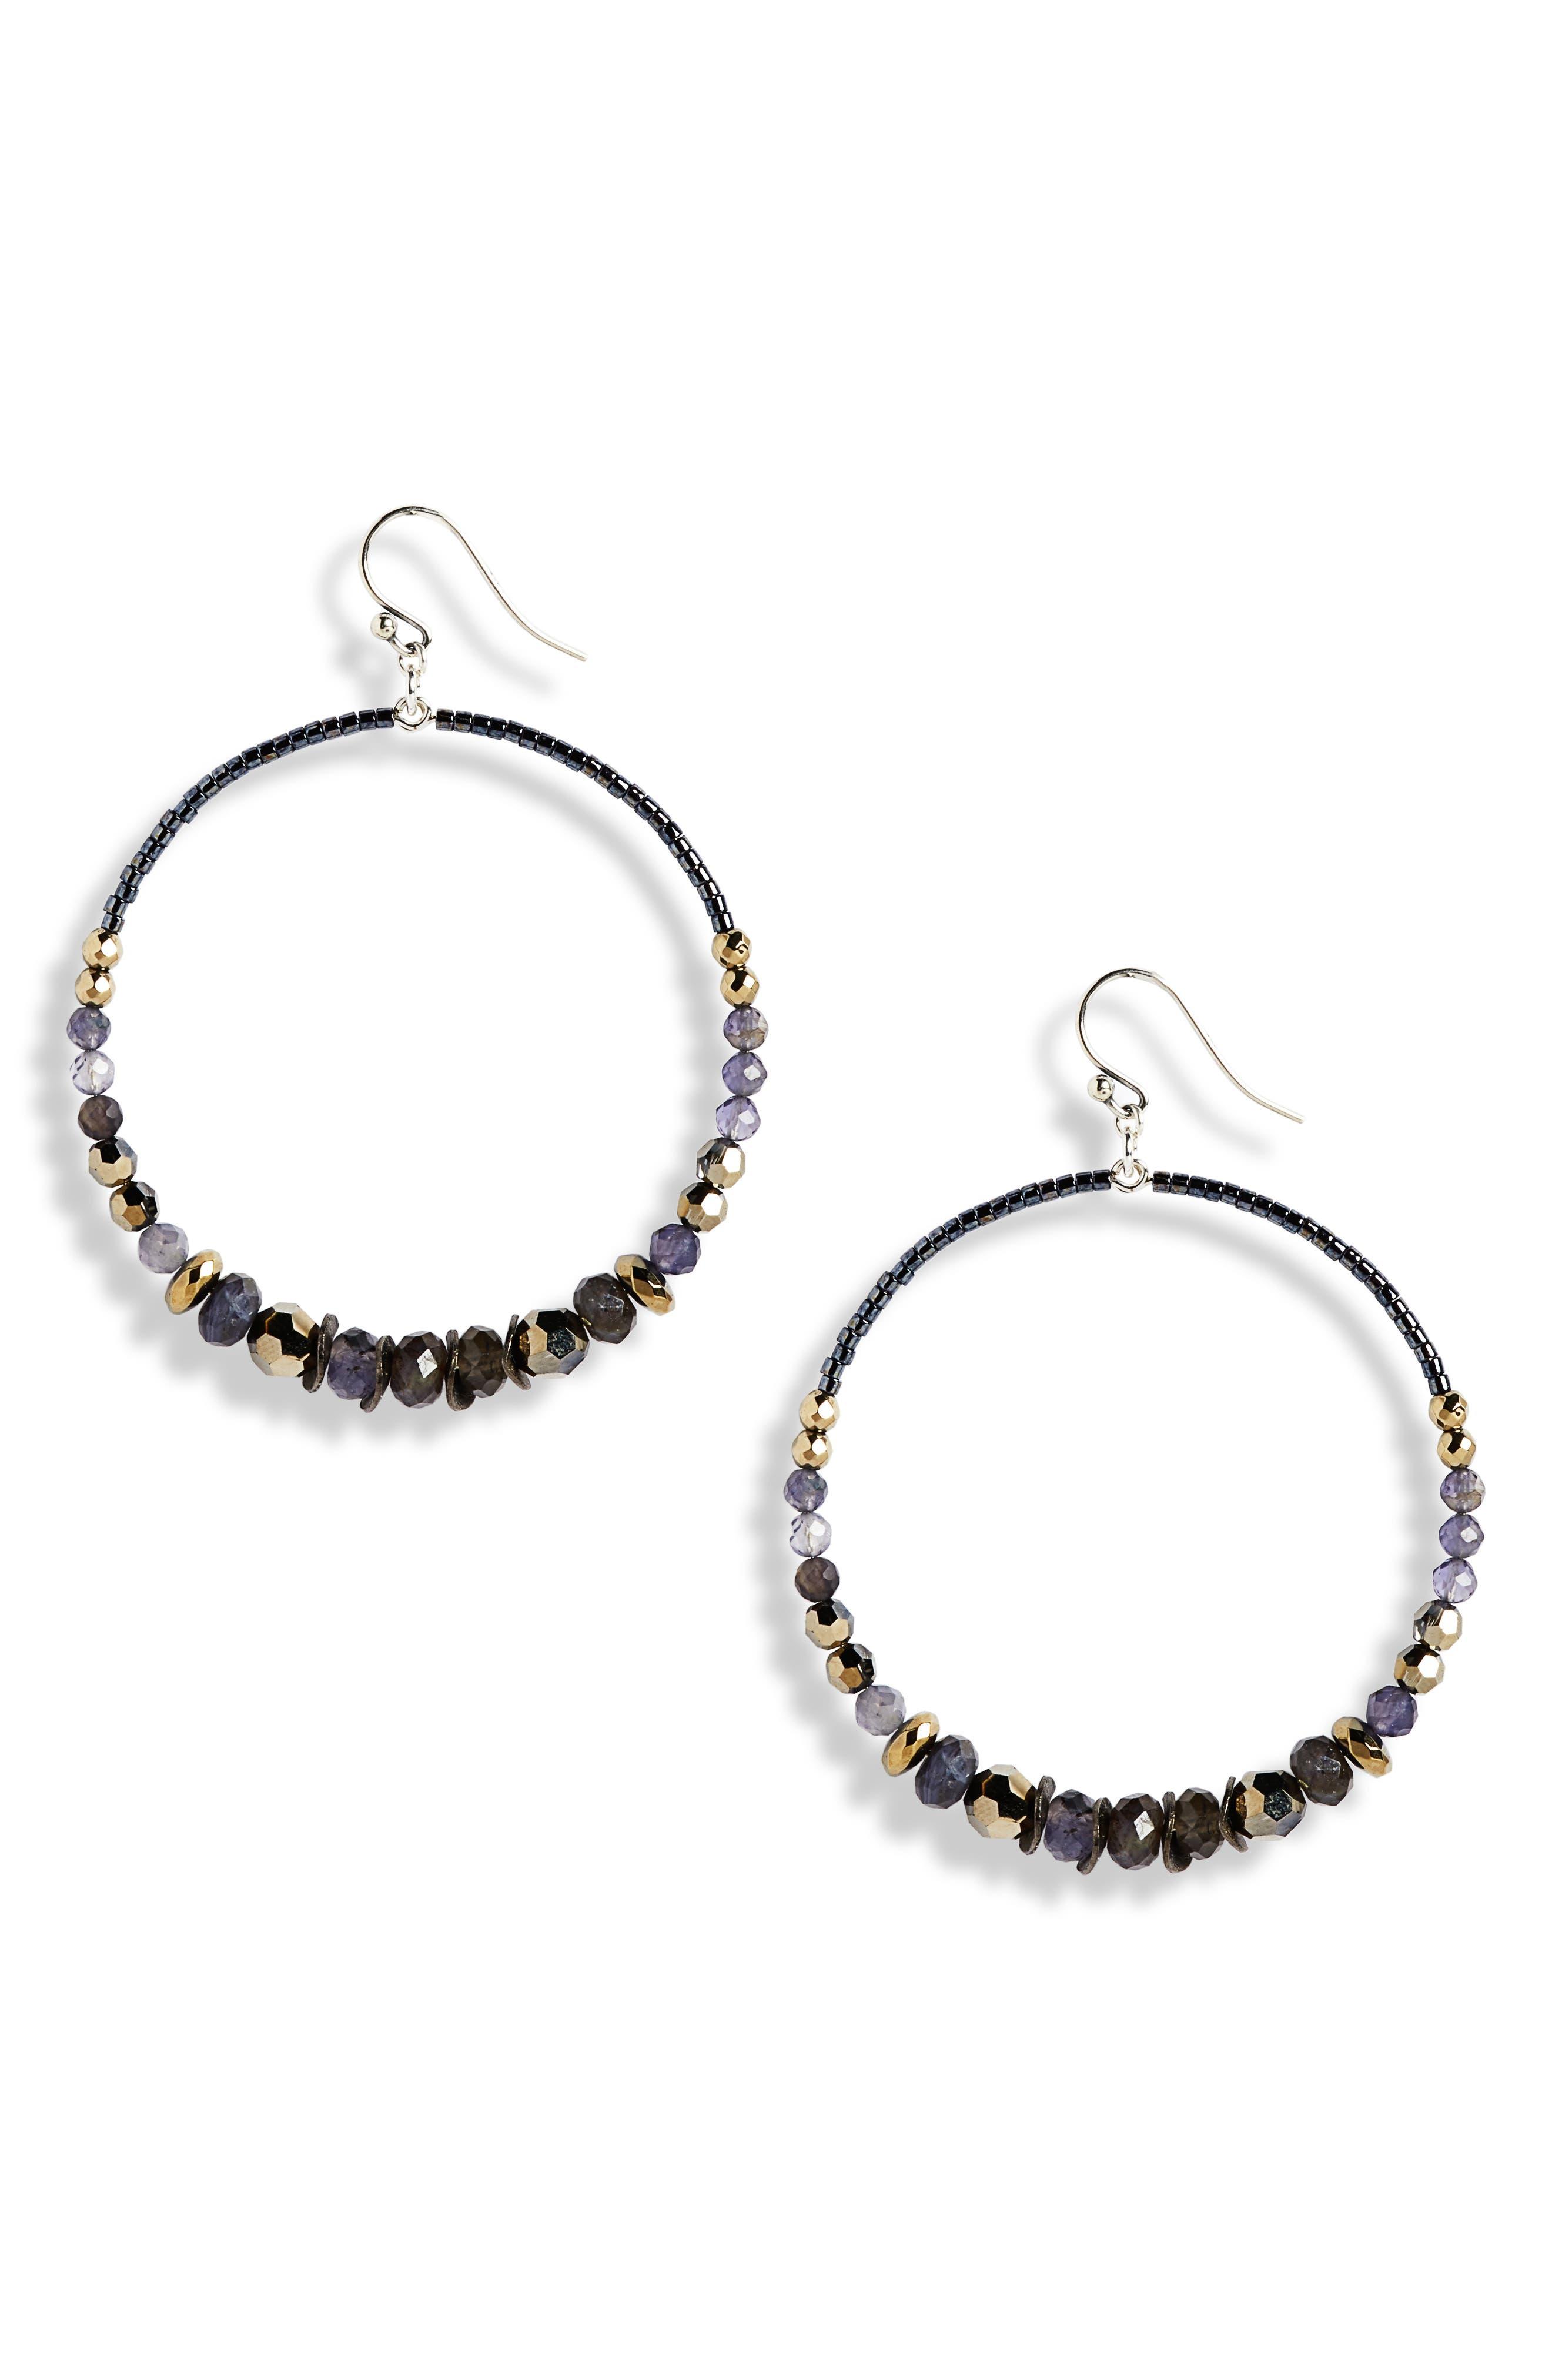 Mixed Stone & Crystal Hoop Earrings,                             Main thumbnail 1, color,                             METALLIC LIGHT GOLD MIX